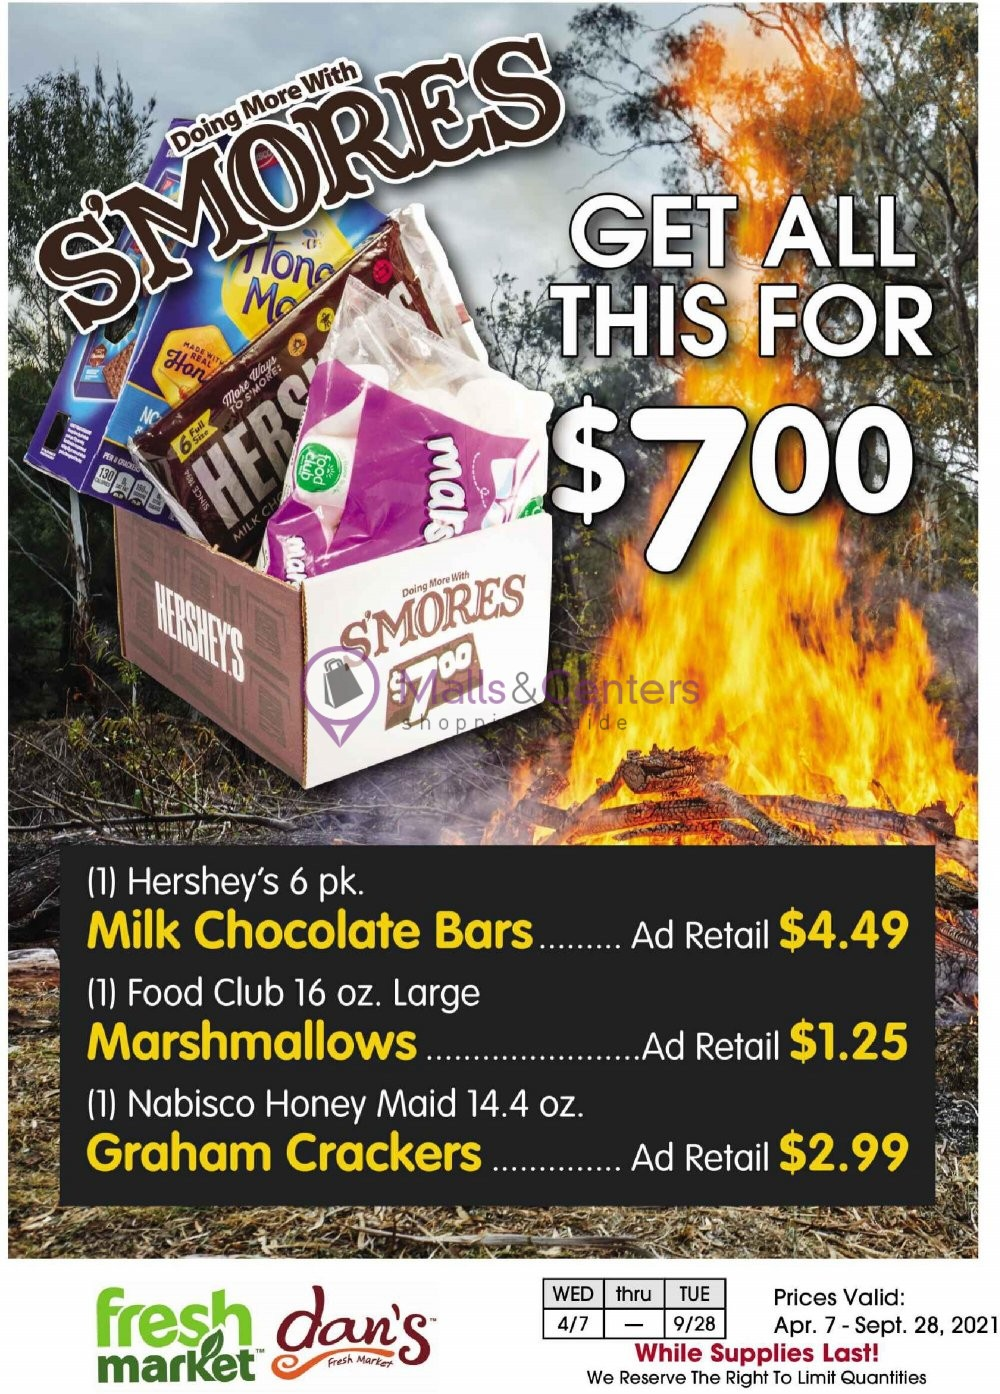 weekly ads Dan's Fresh Market - page 1 - mallscenters.com